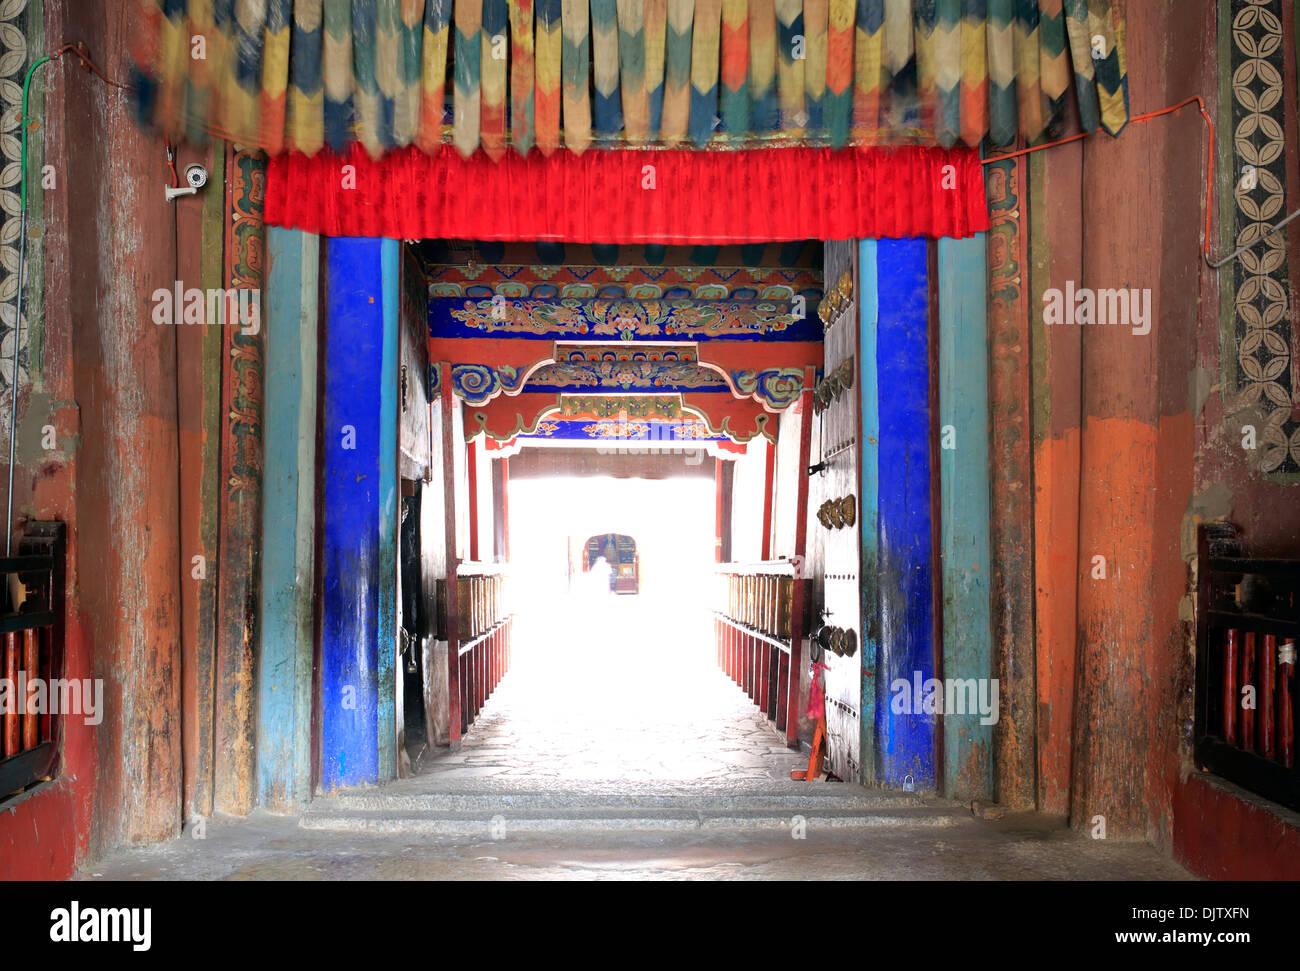 Entrance to Sakya Monastery, Shigatse Prefecture, Tibet, China - Stock Image